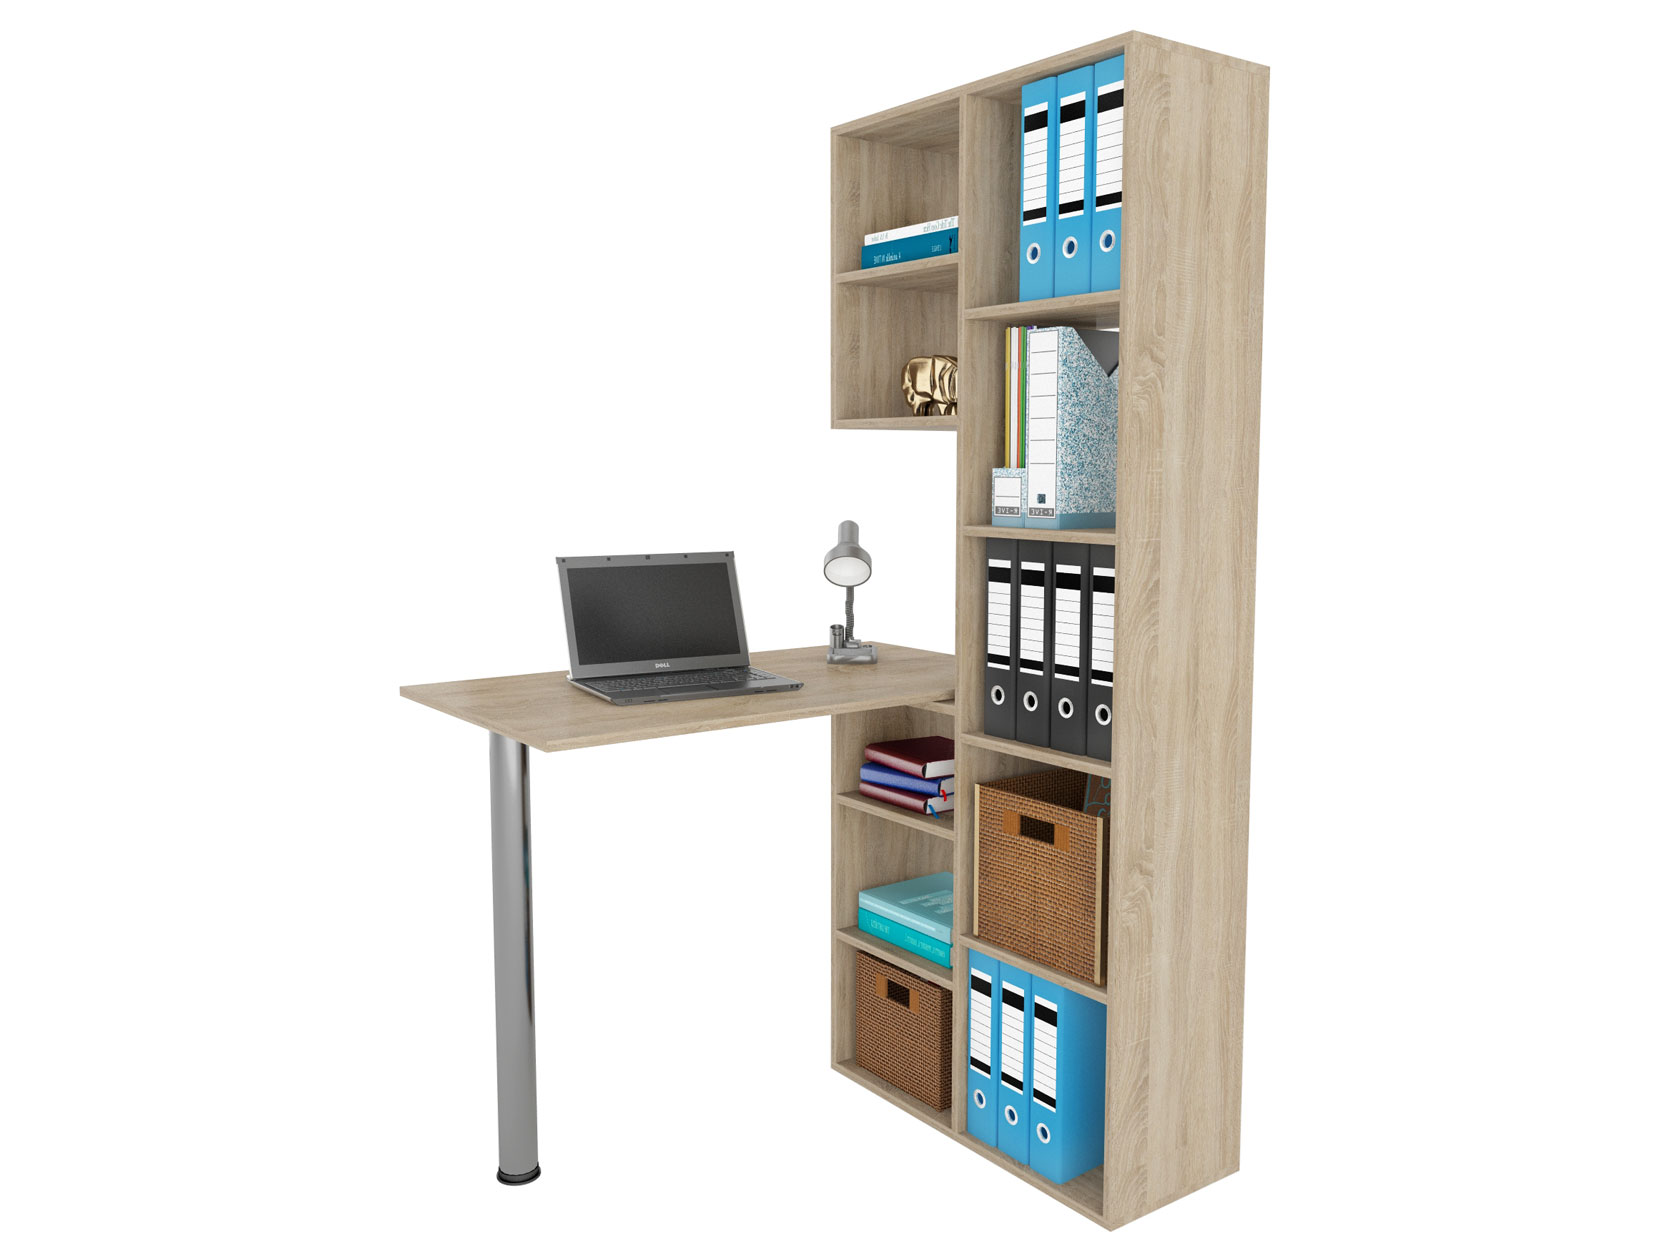 Компьютерный стол в комплекте МФ Мастер Рикс-2+Рикс-6 110x97,8x171,6, дуб сонома